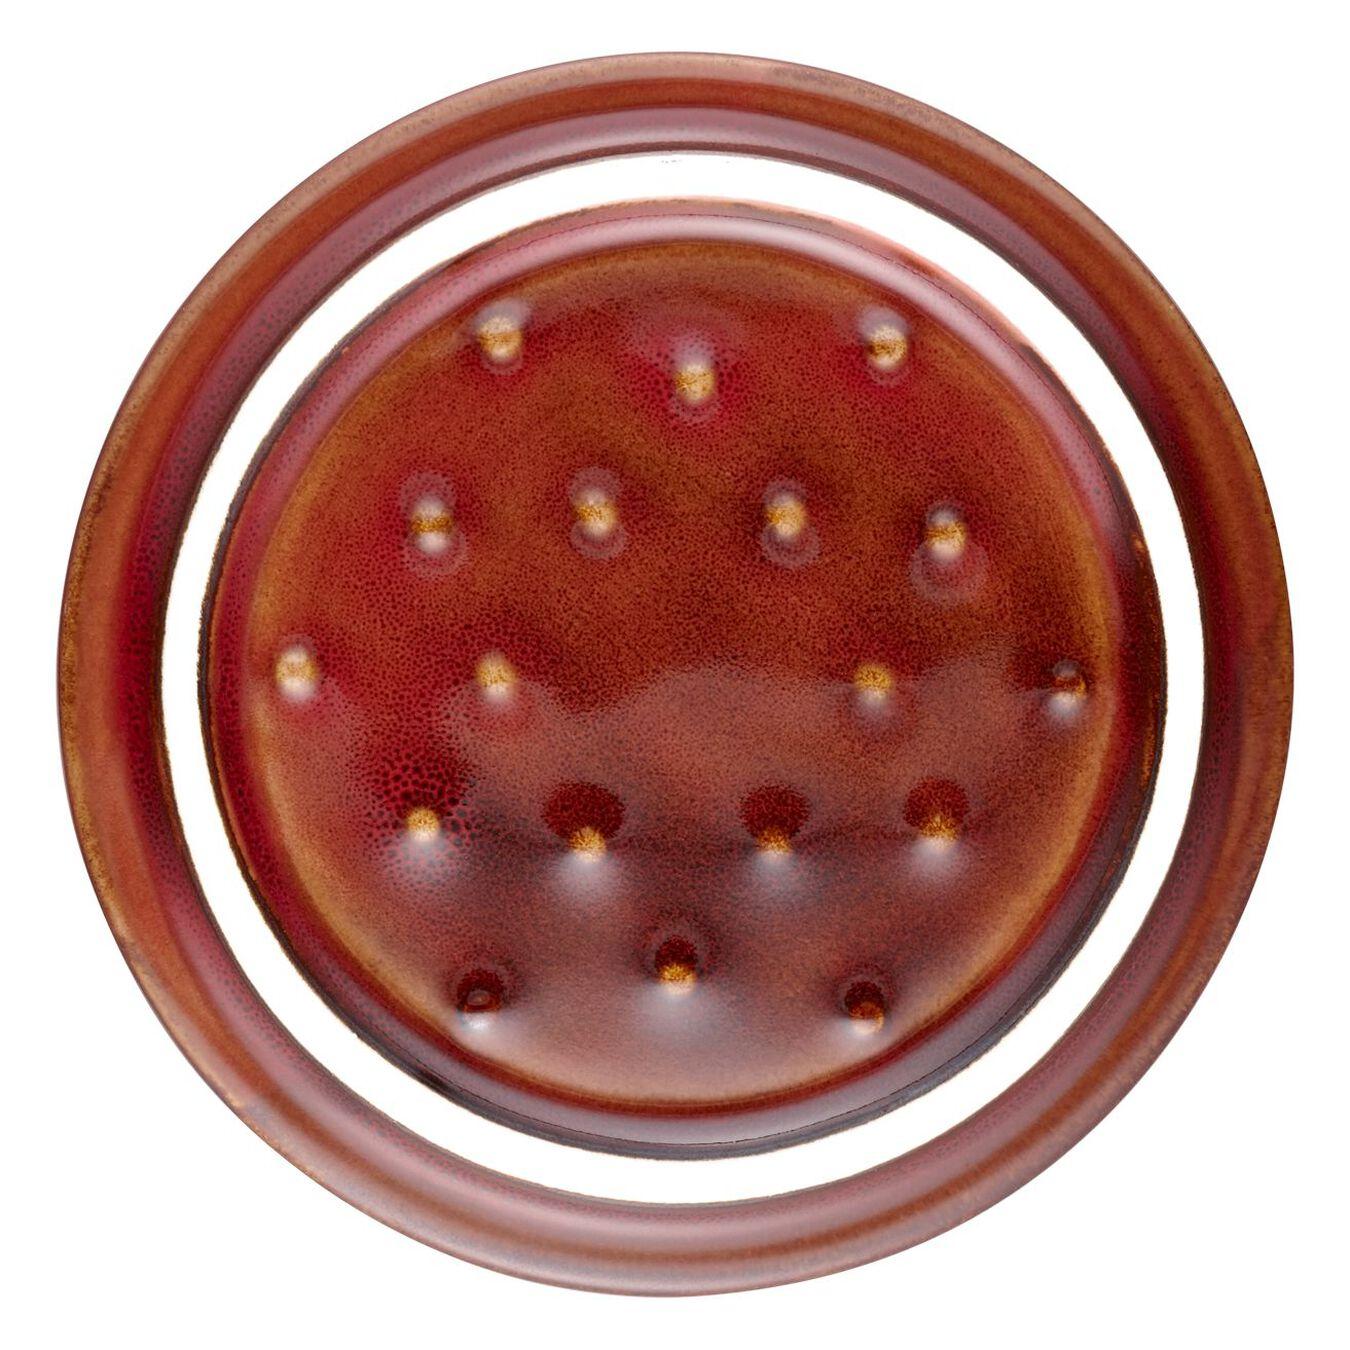 Mini cocotte rotonda - 10 cm, rame antico,,large 4